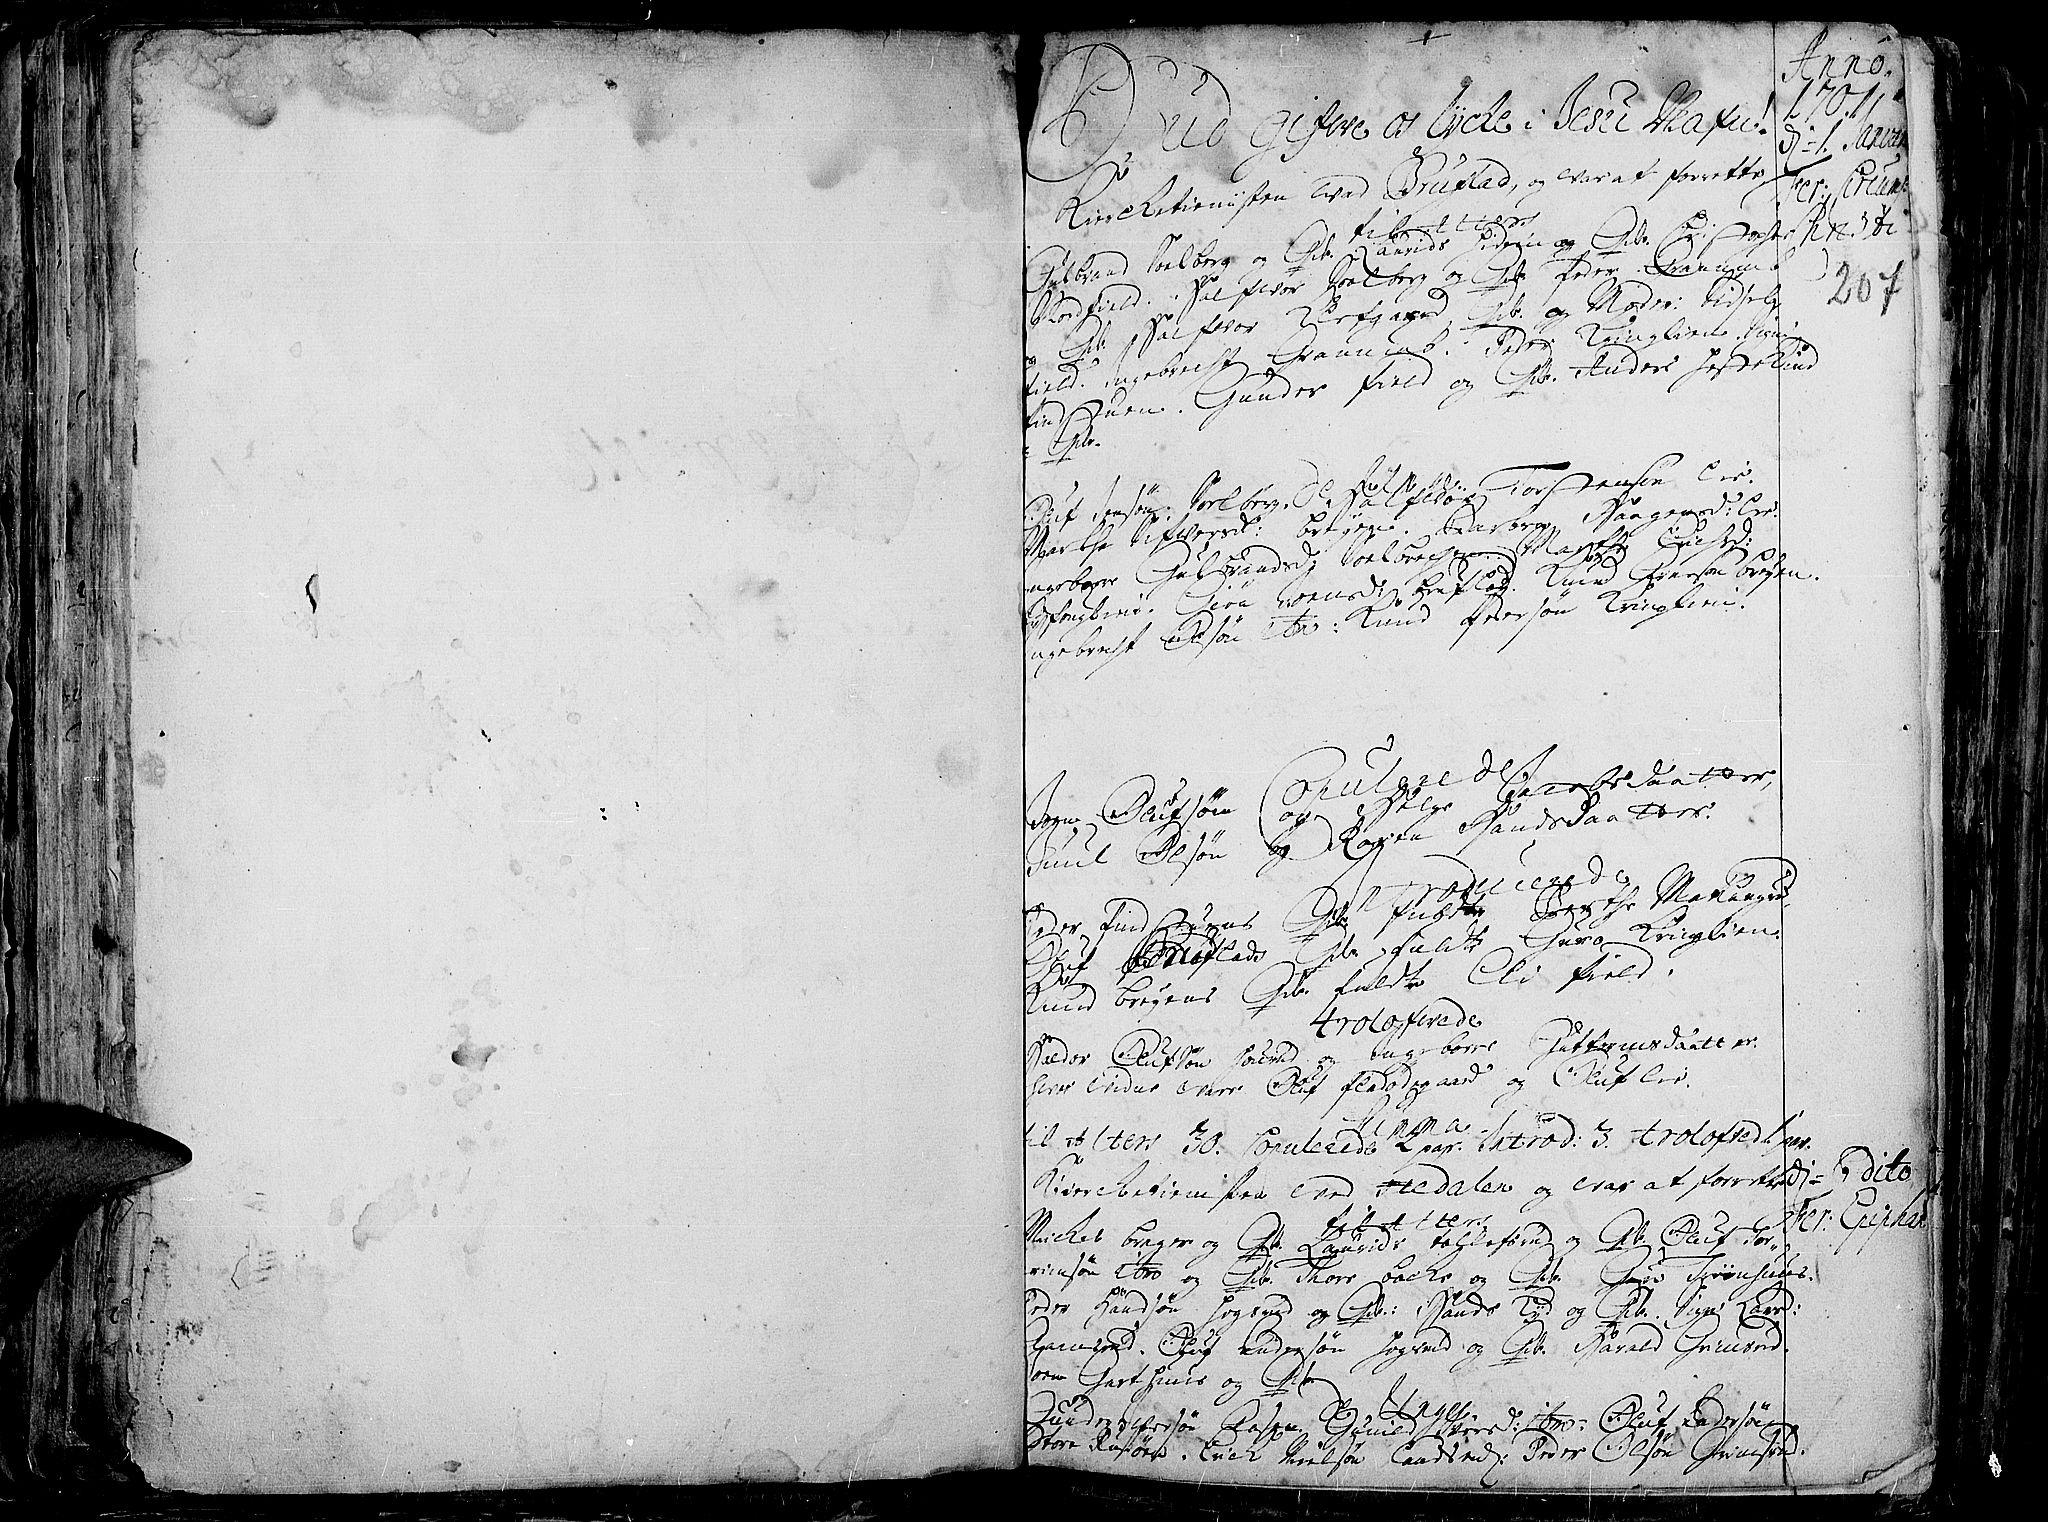 SAH, Aurdal prestekontor, Ministerialbok nr. 1-3, 1692-1730, s. 207